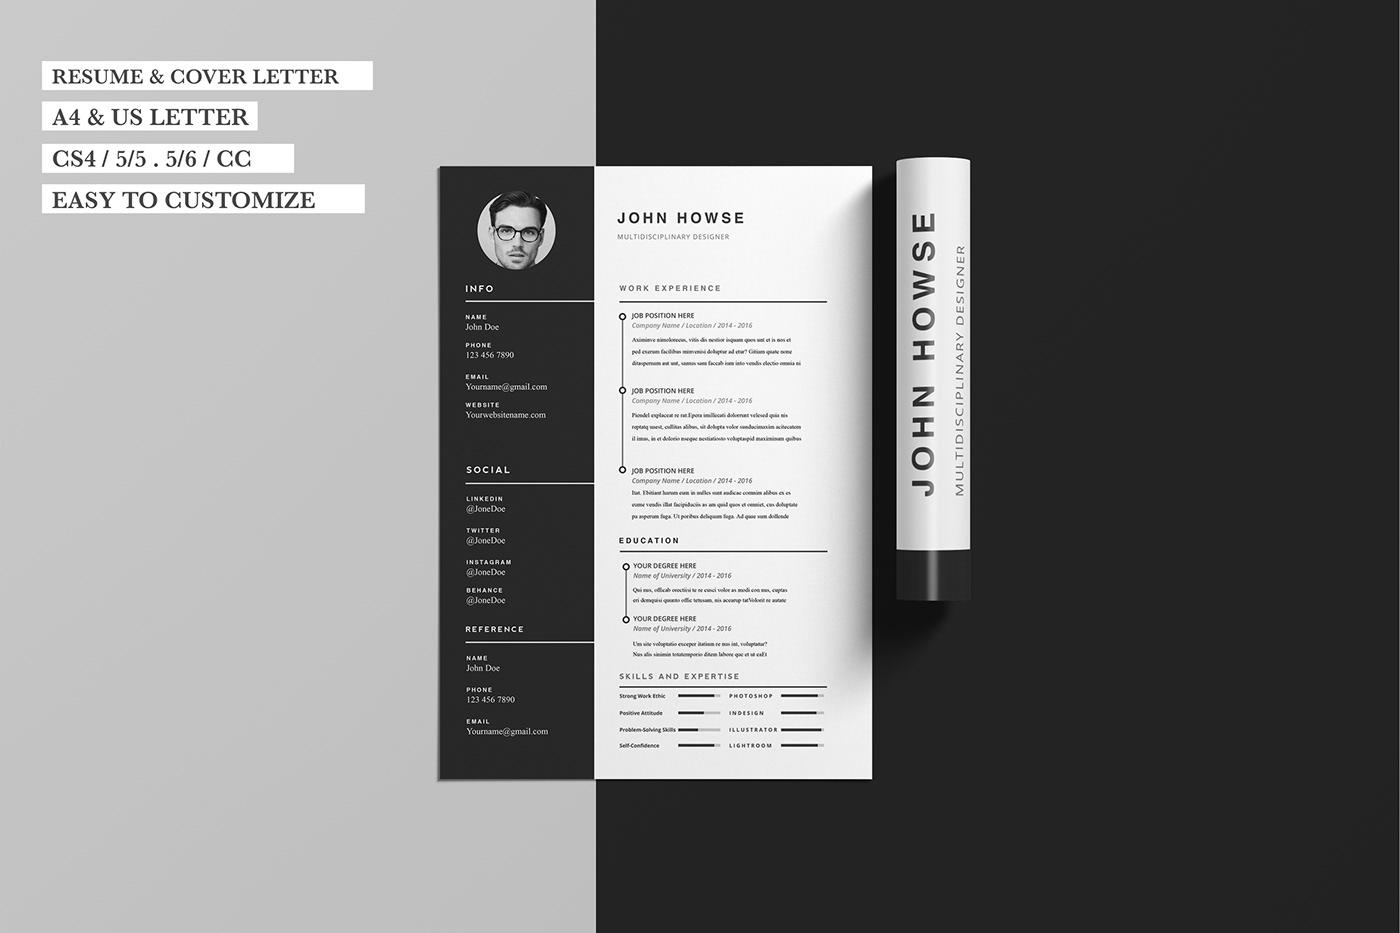 Resume CV freebie free template Free Resume Free Cover Letter free mock up Free Template resume example